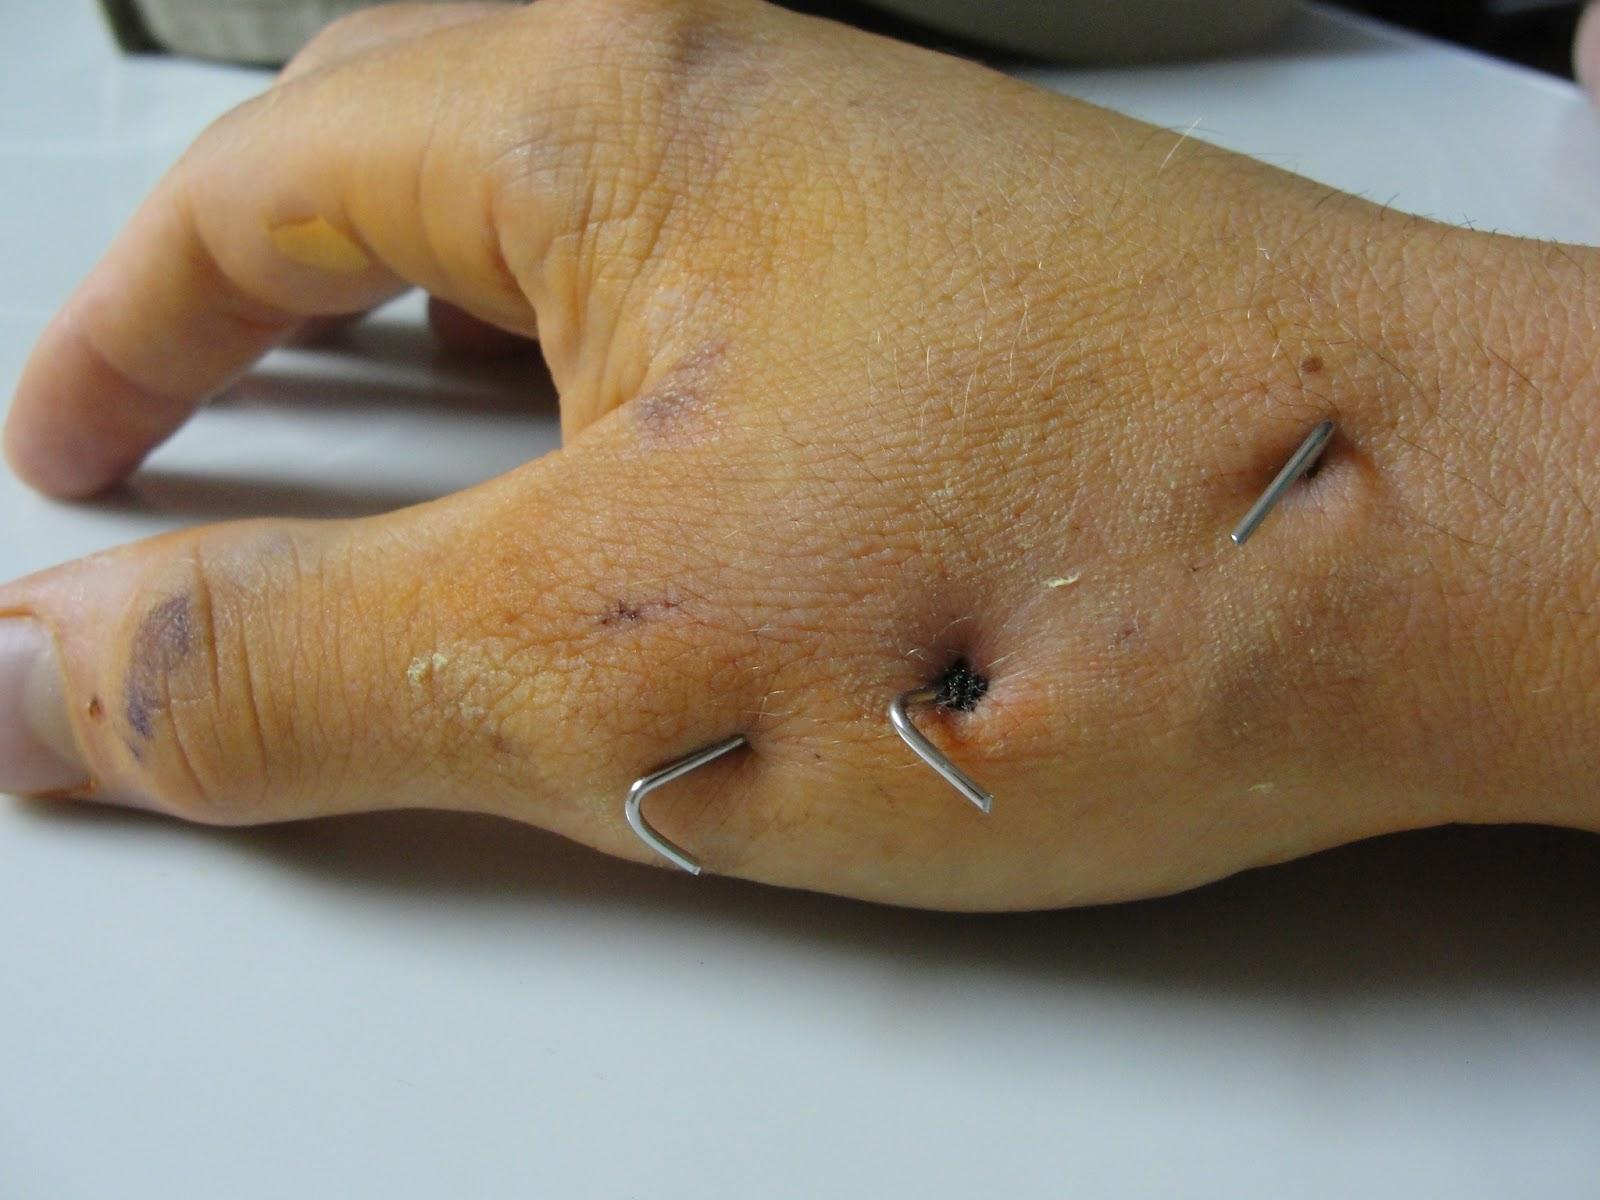 Joint Surgery Cast Basal